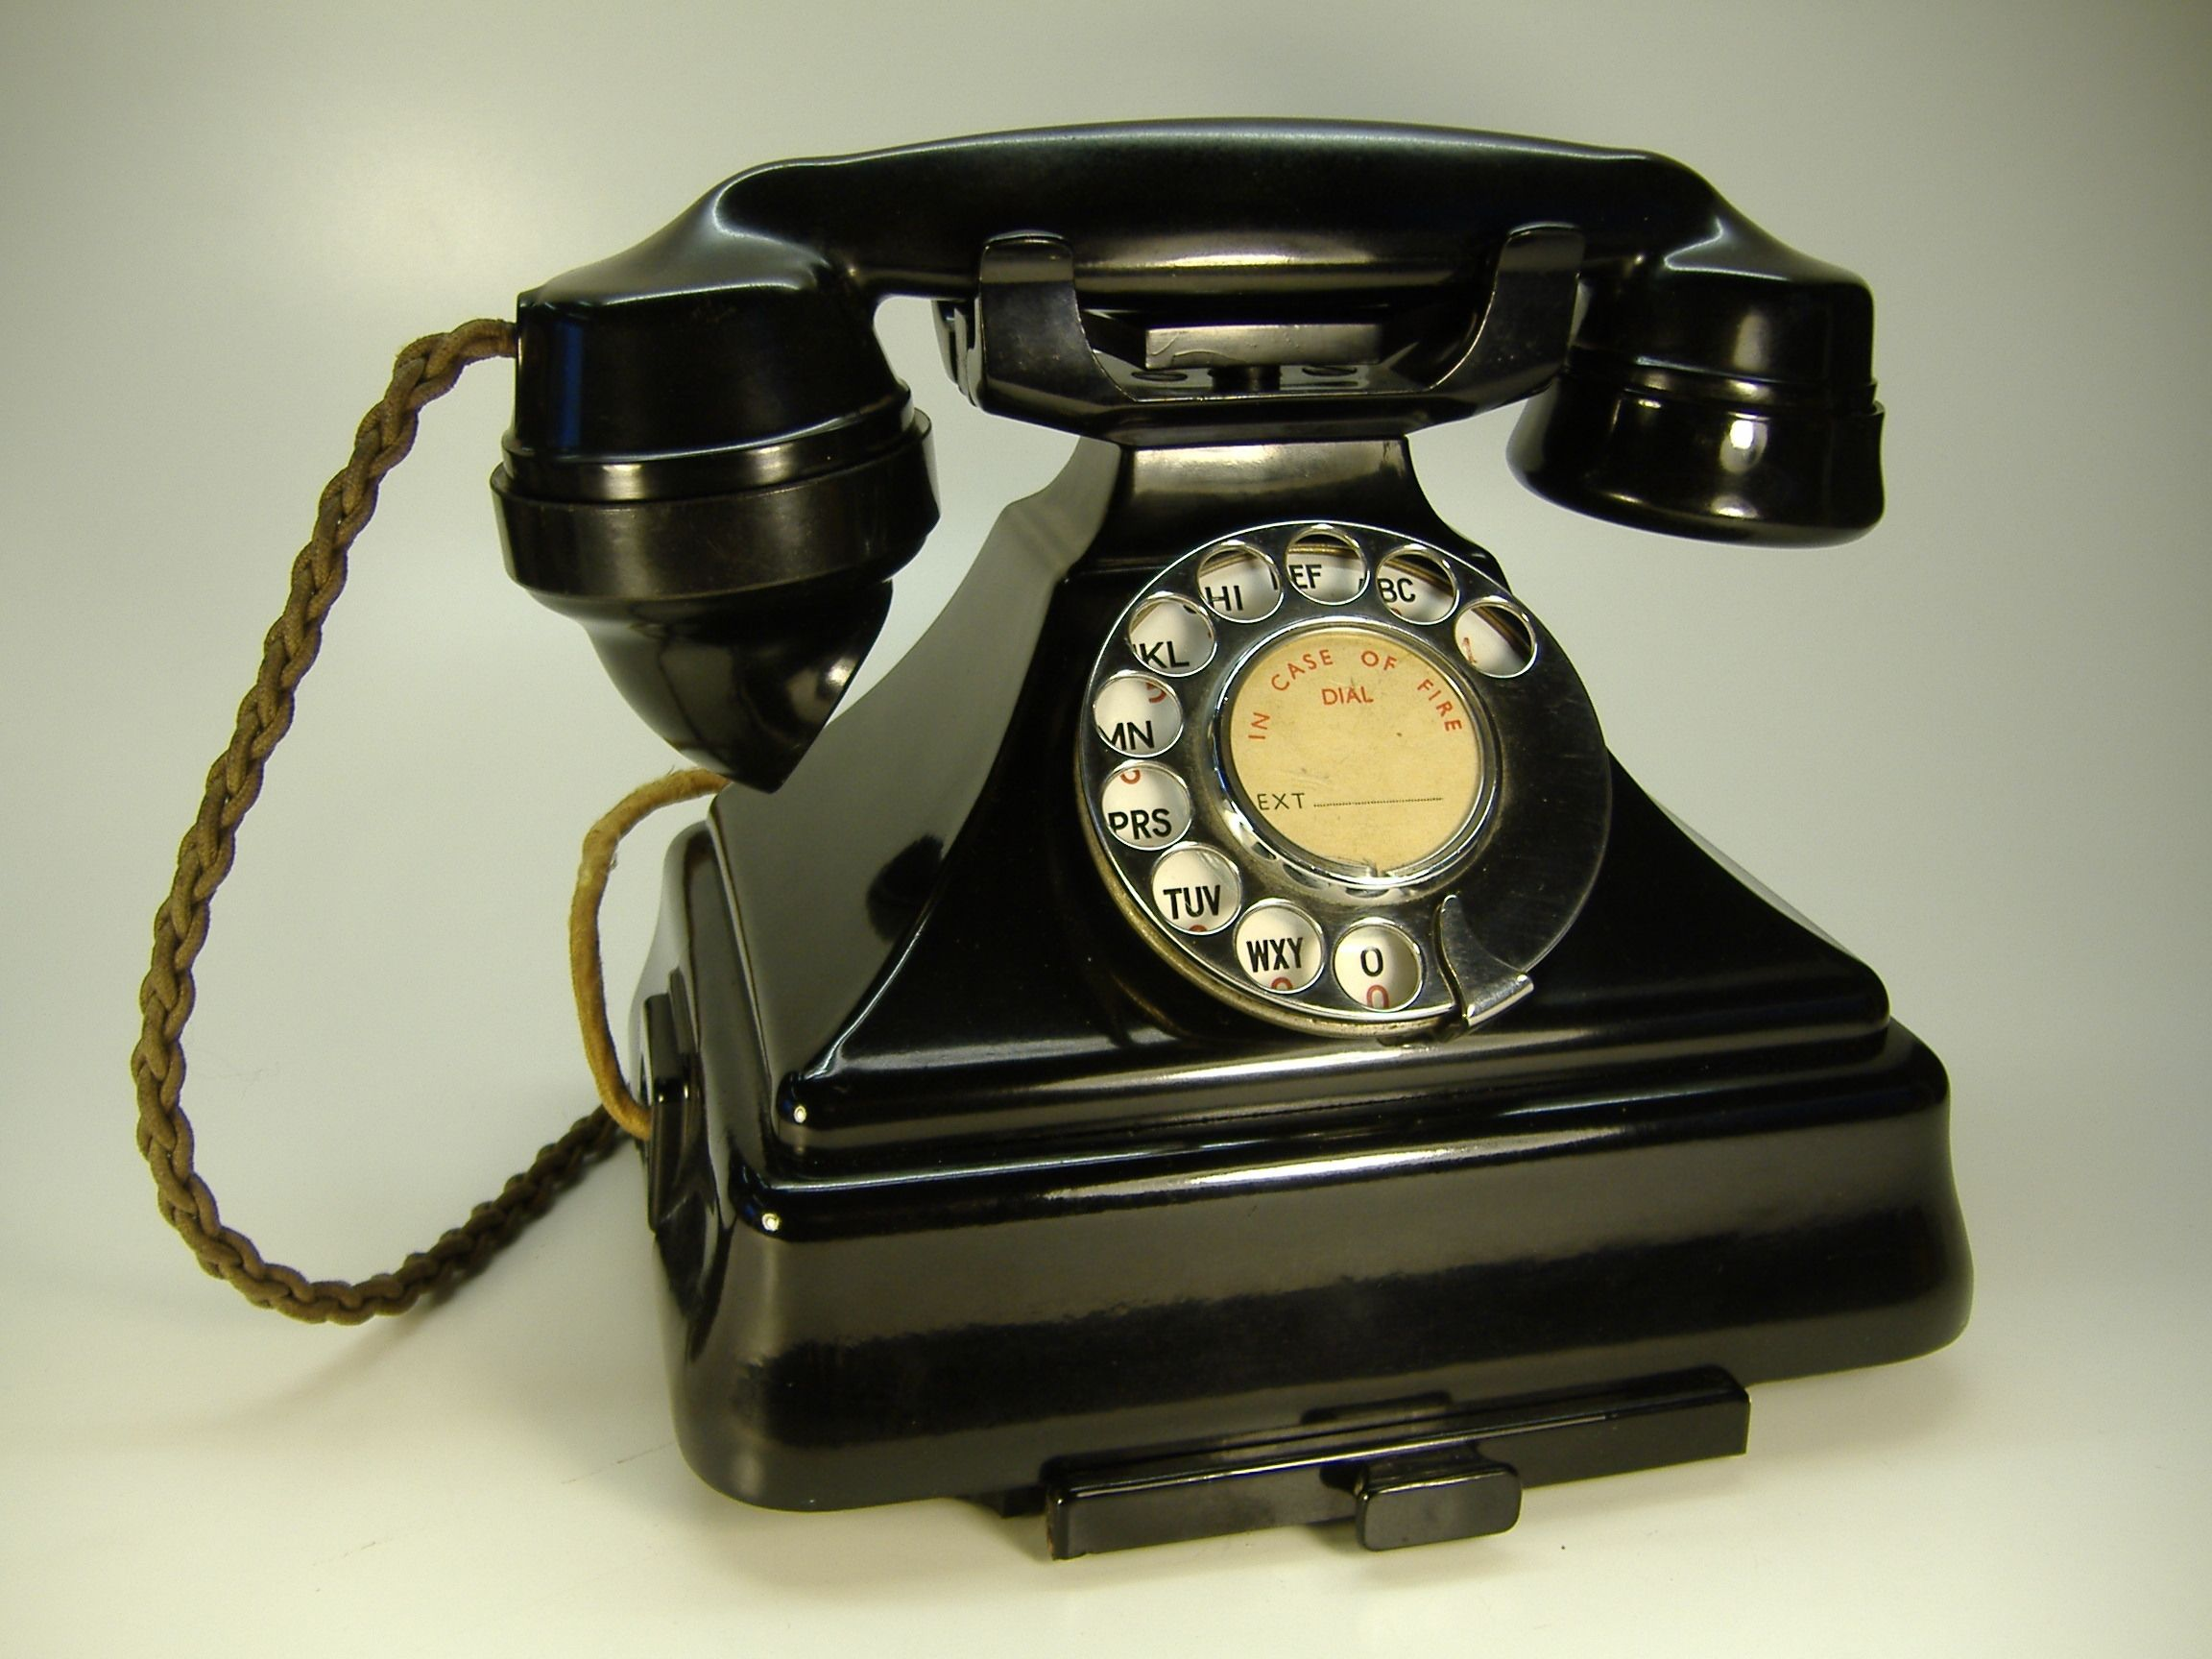 medium resolution of bakelite 200 series telephone telephone vintage vintage phones antique phone retro phone